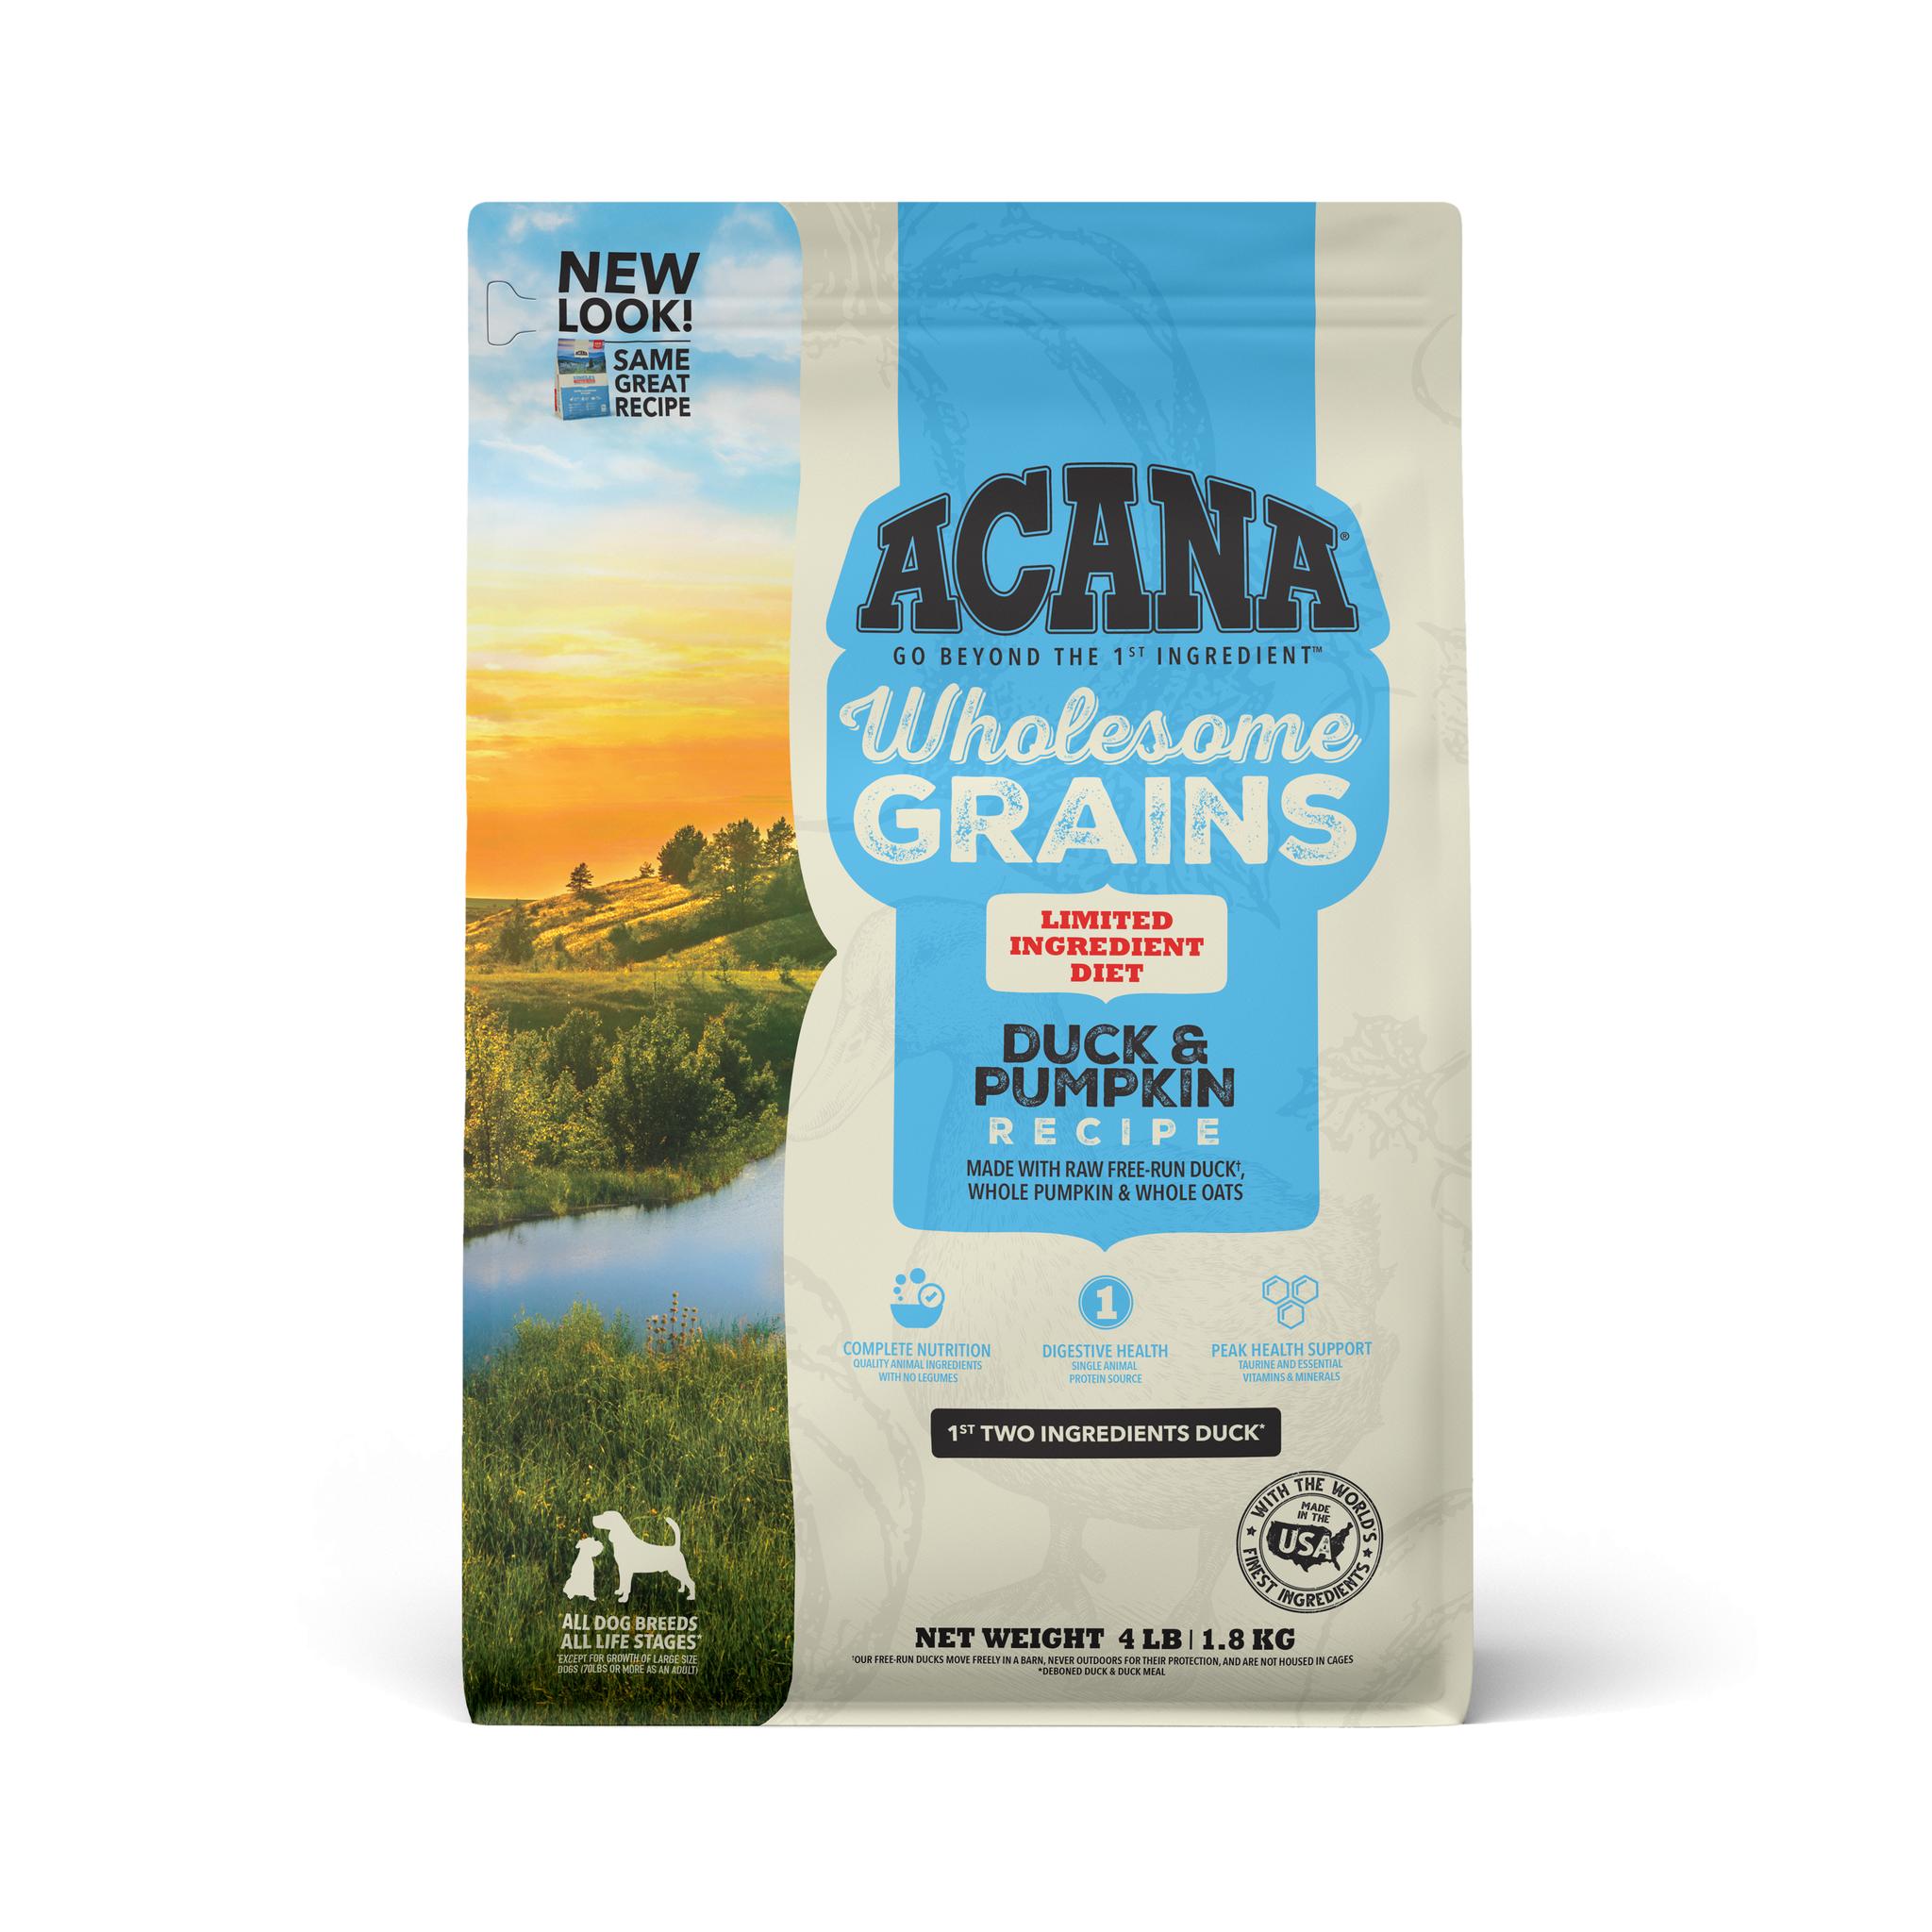 Acana Acana Singles Wholesome Grains Duck & Pumpkin Dry Dog Food